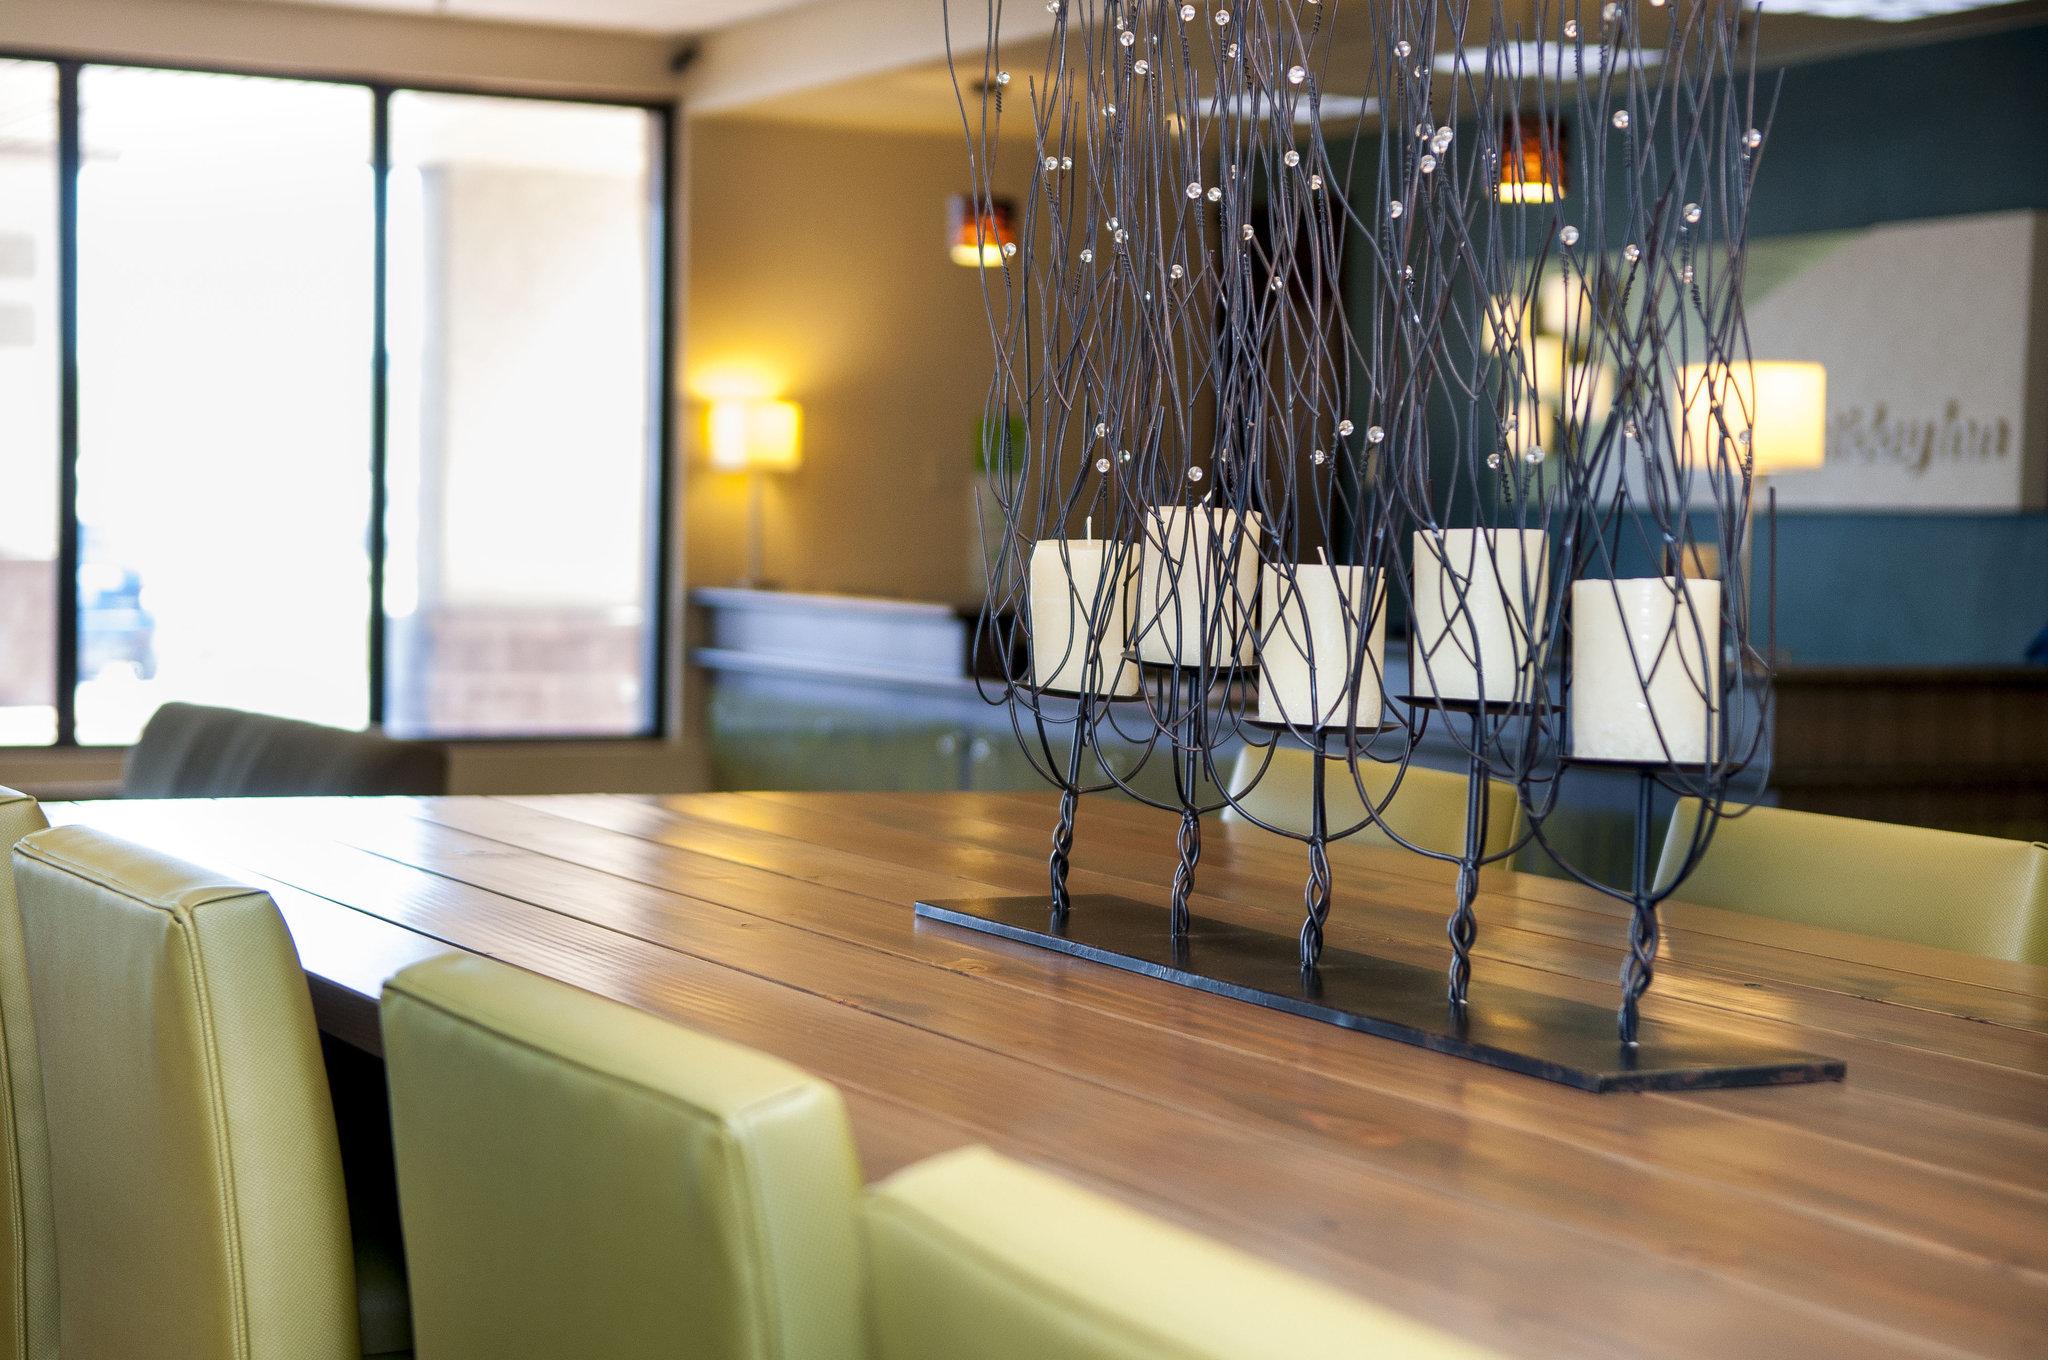 Holiday Inn Spearfish